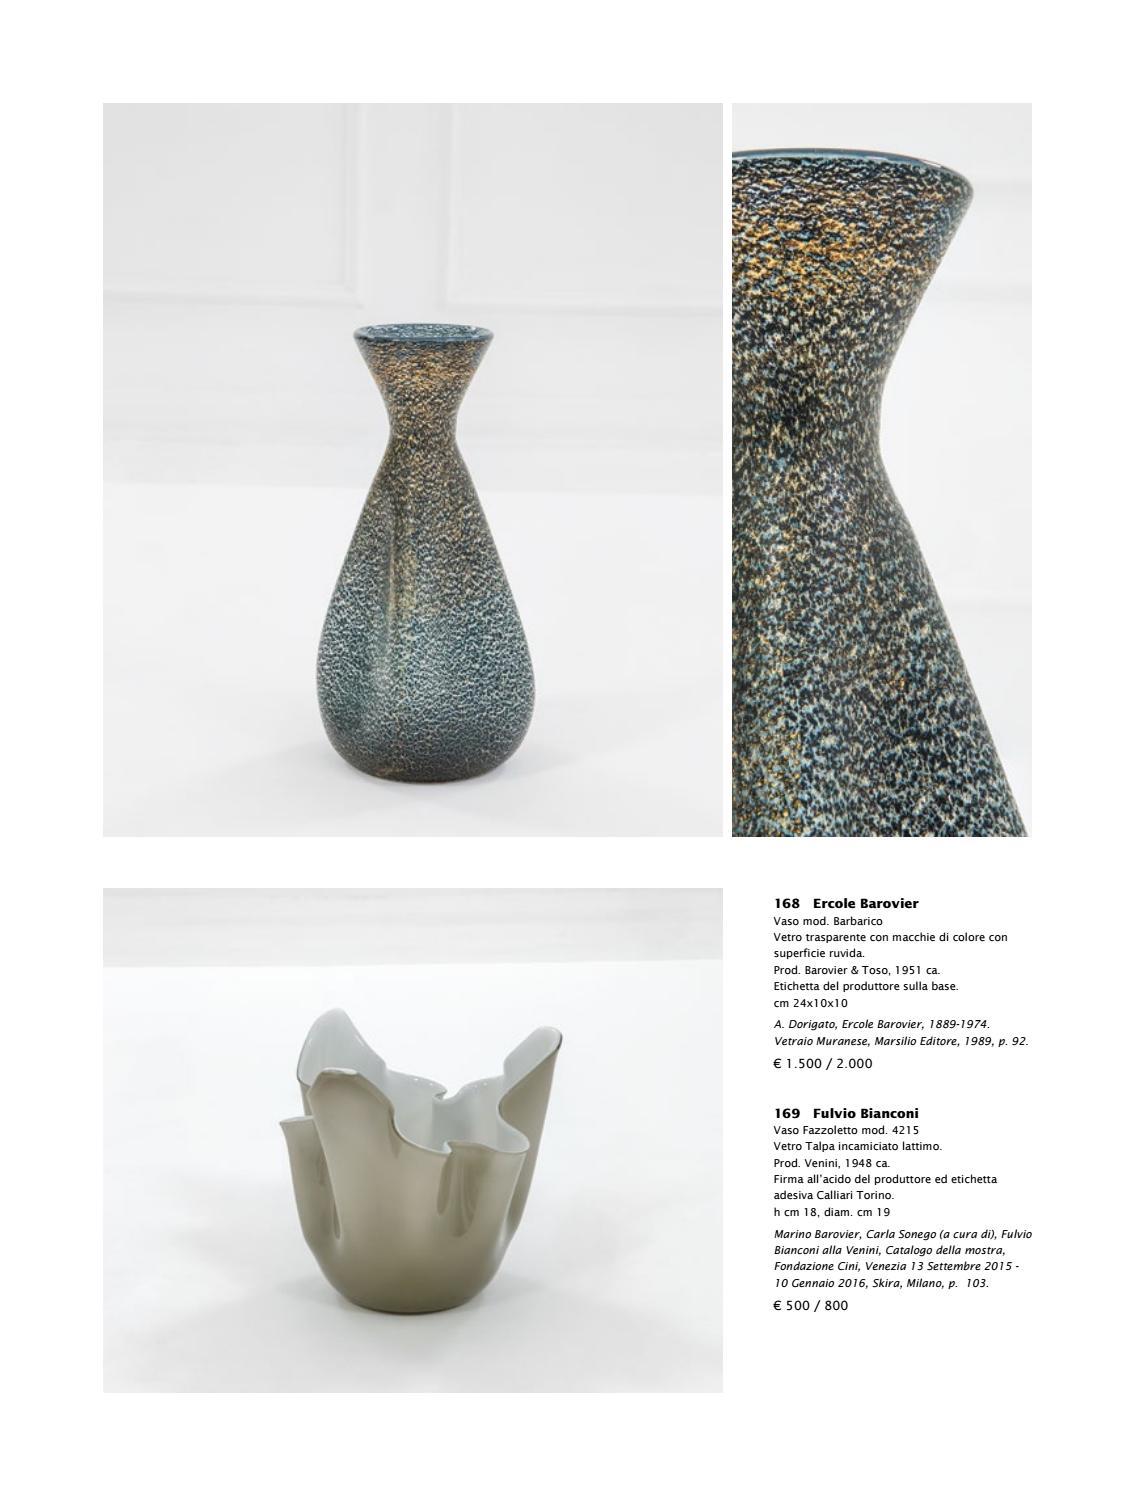 Adesivo Per Vetrai design auction | vebuka